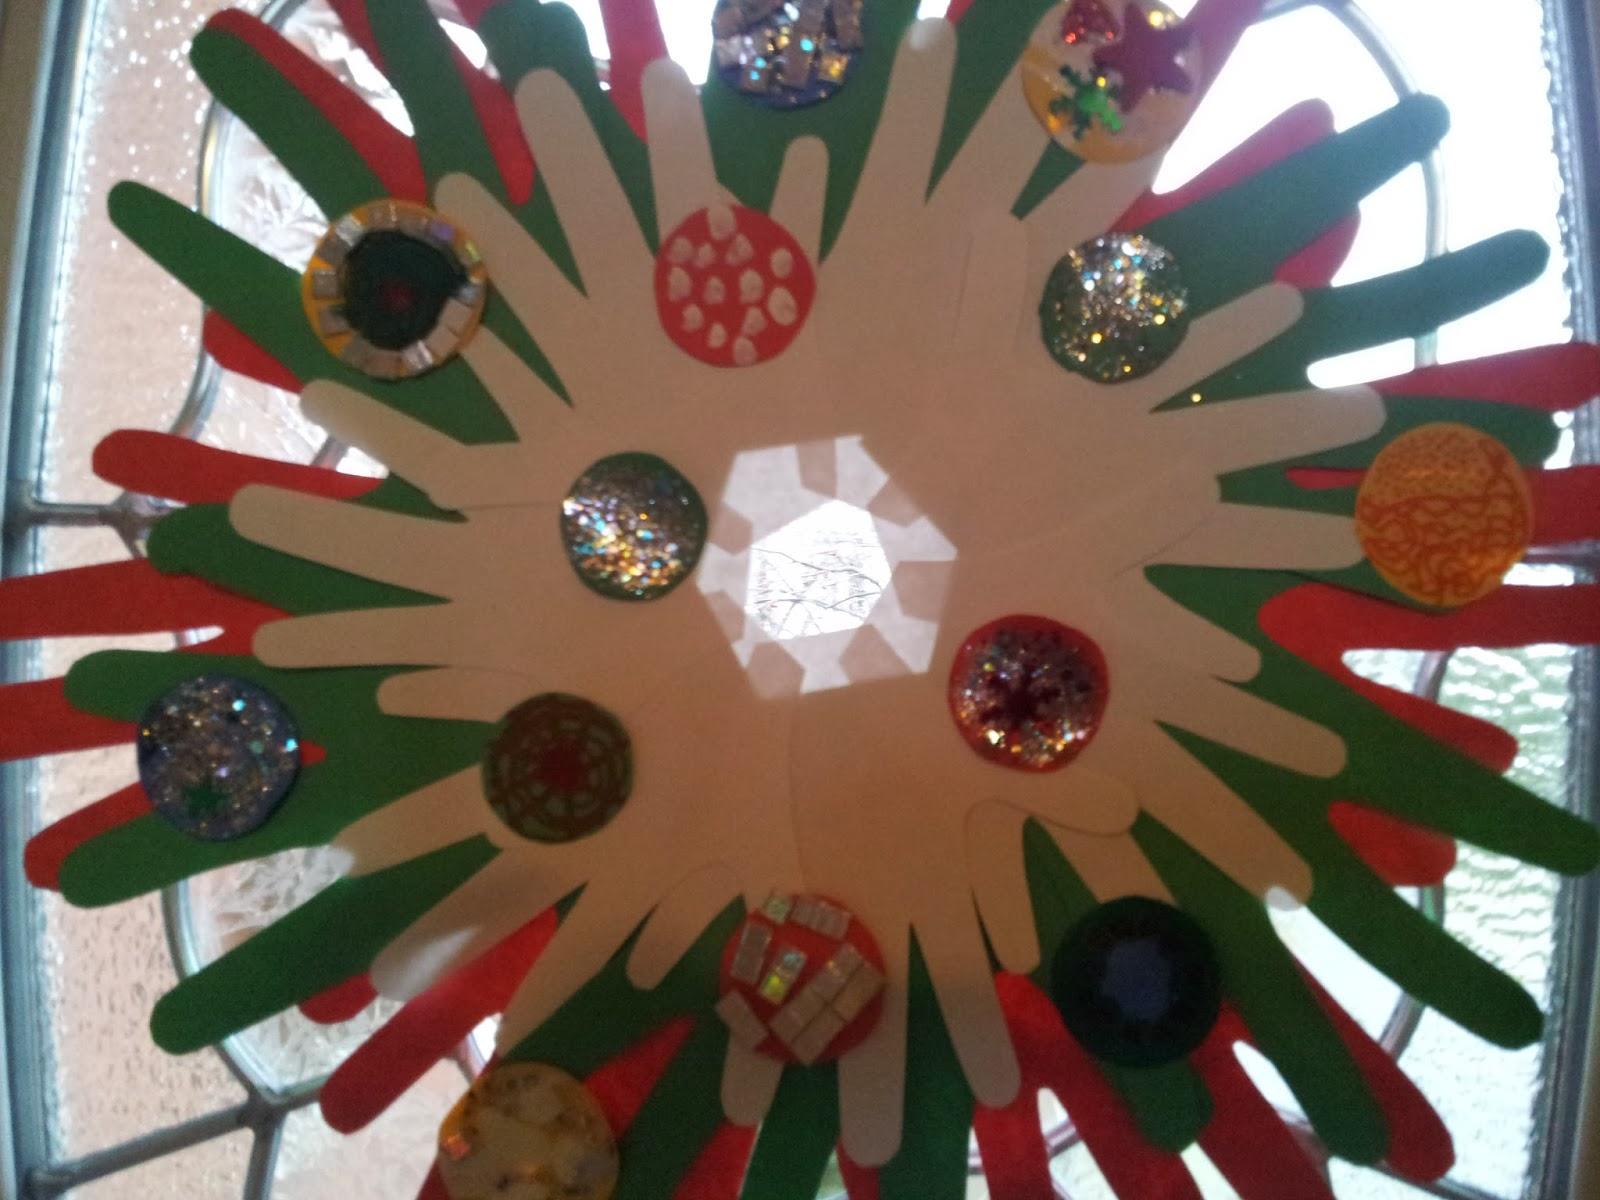 Handprint Christmas wreath craft